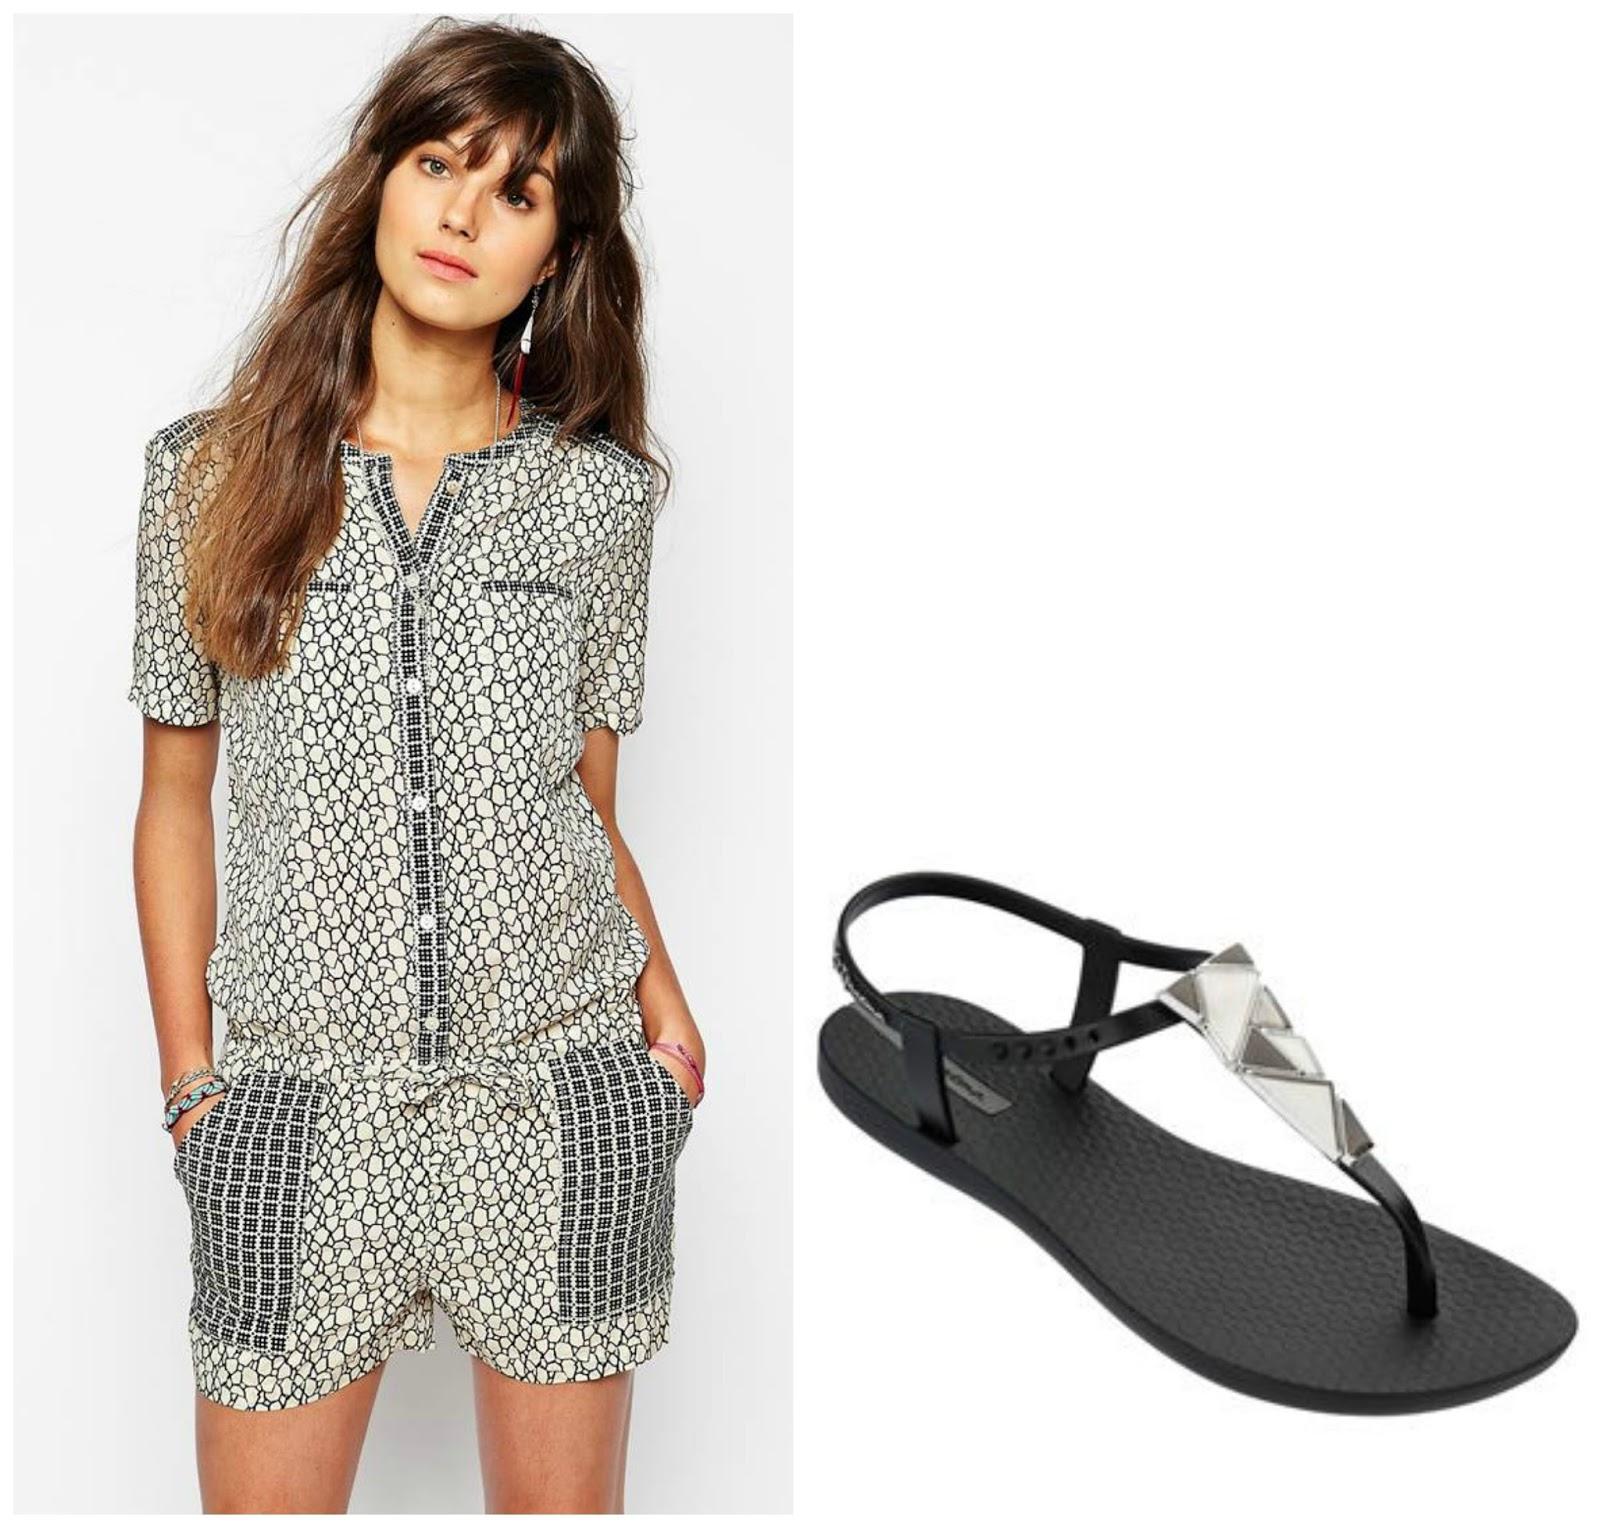 Ipanema Footwear / Asos Outfit